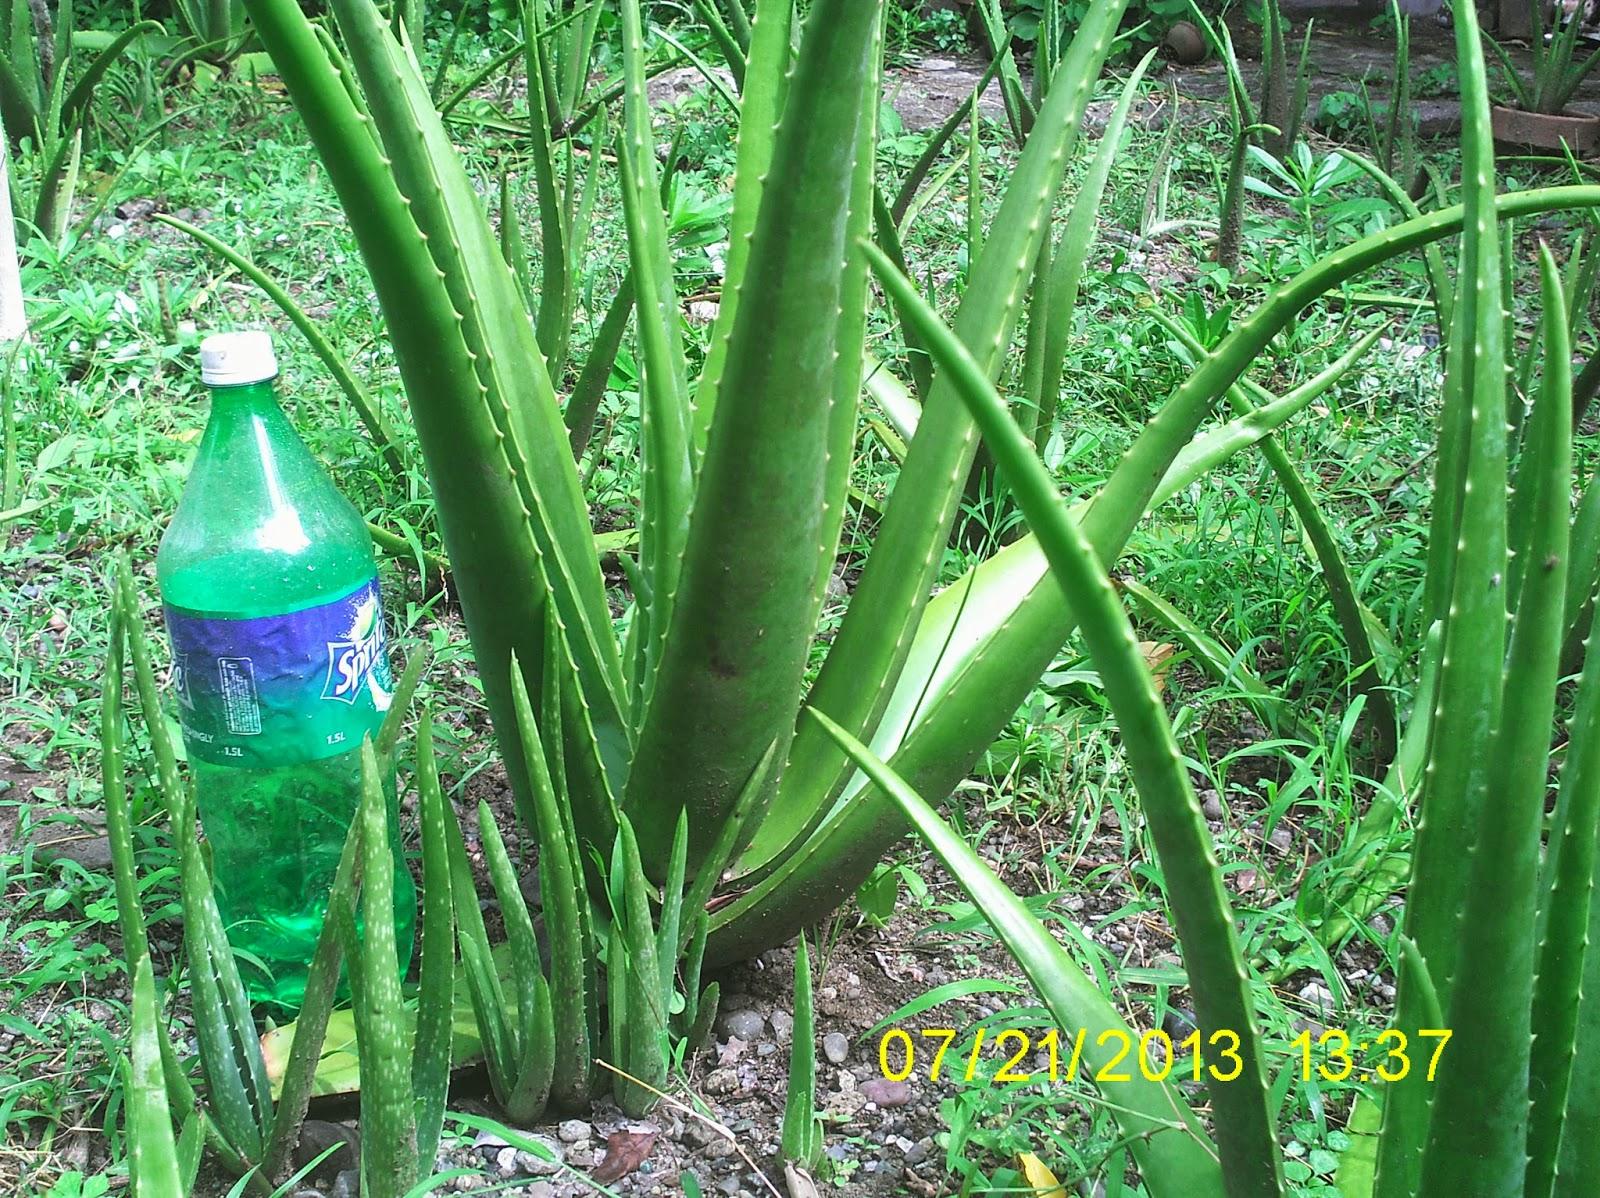 Maning garden aloe vera aloe barbadensis miller for Aloe barbadensis